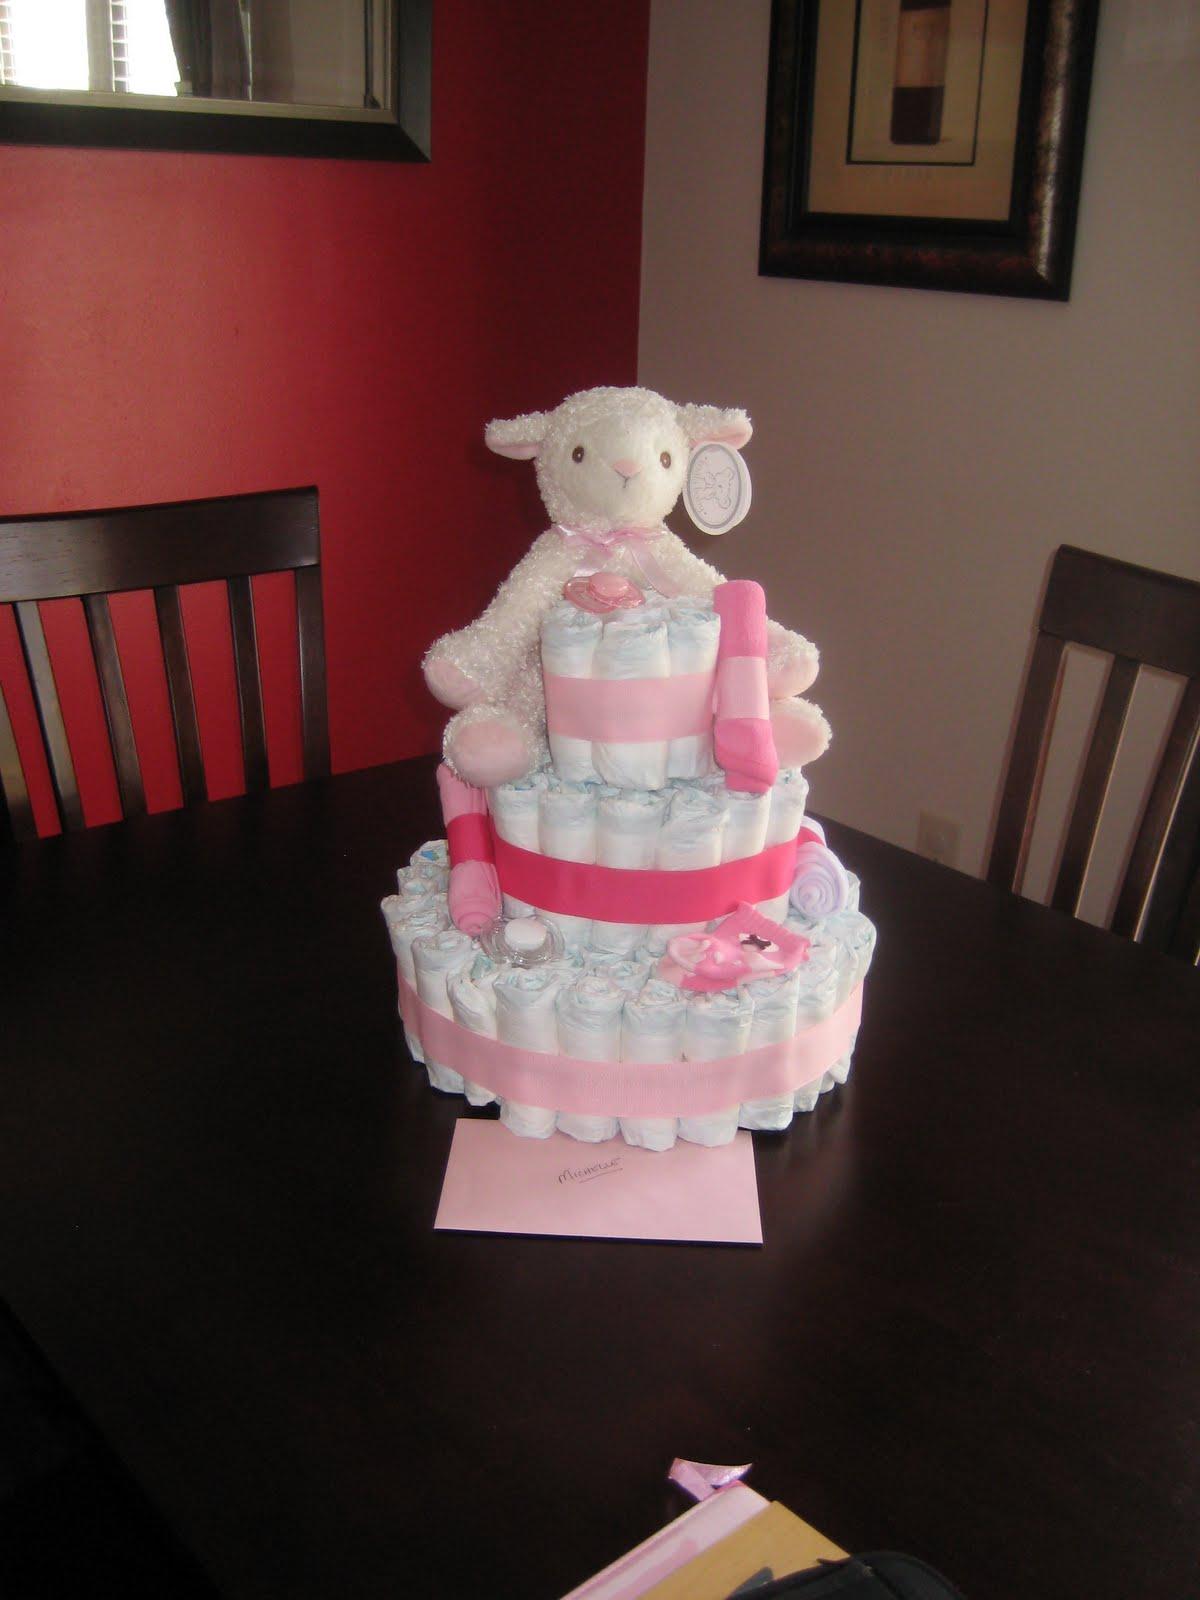 Baby Shower For Third Girl ~ The wertz family rd baby shower for our girl